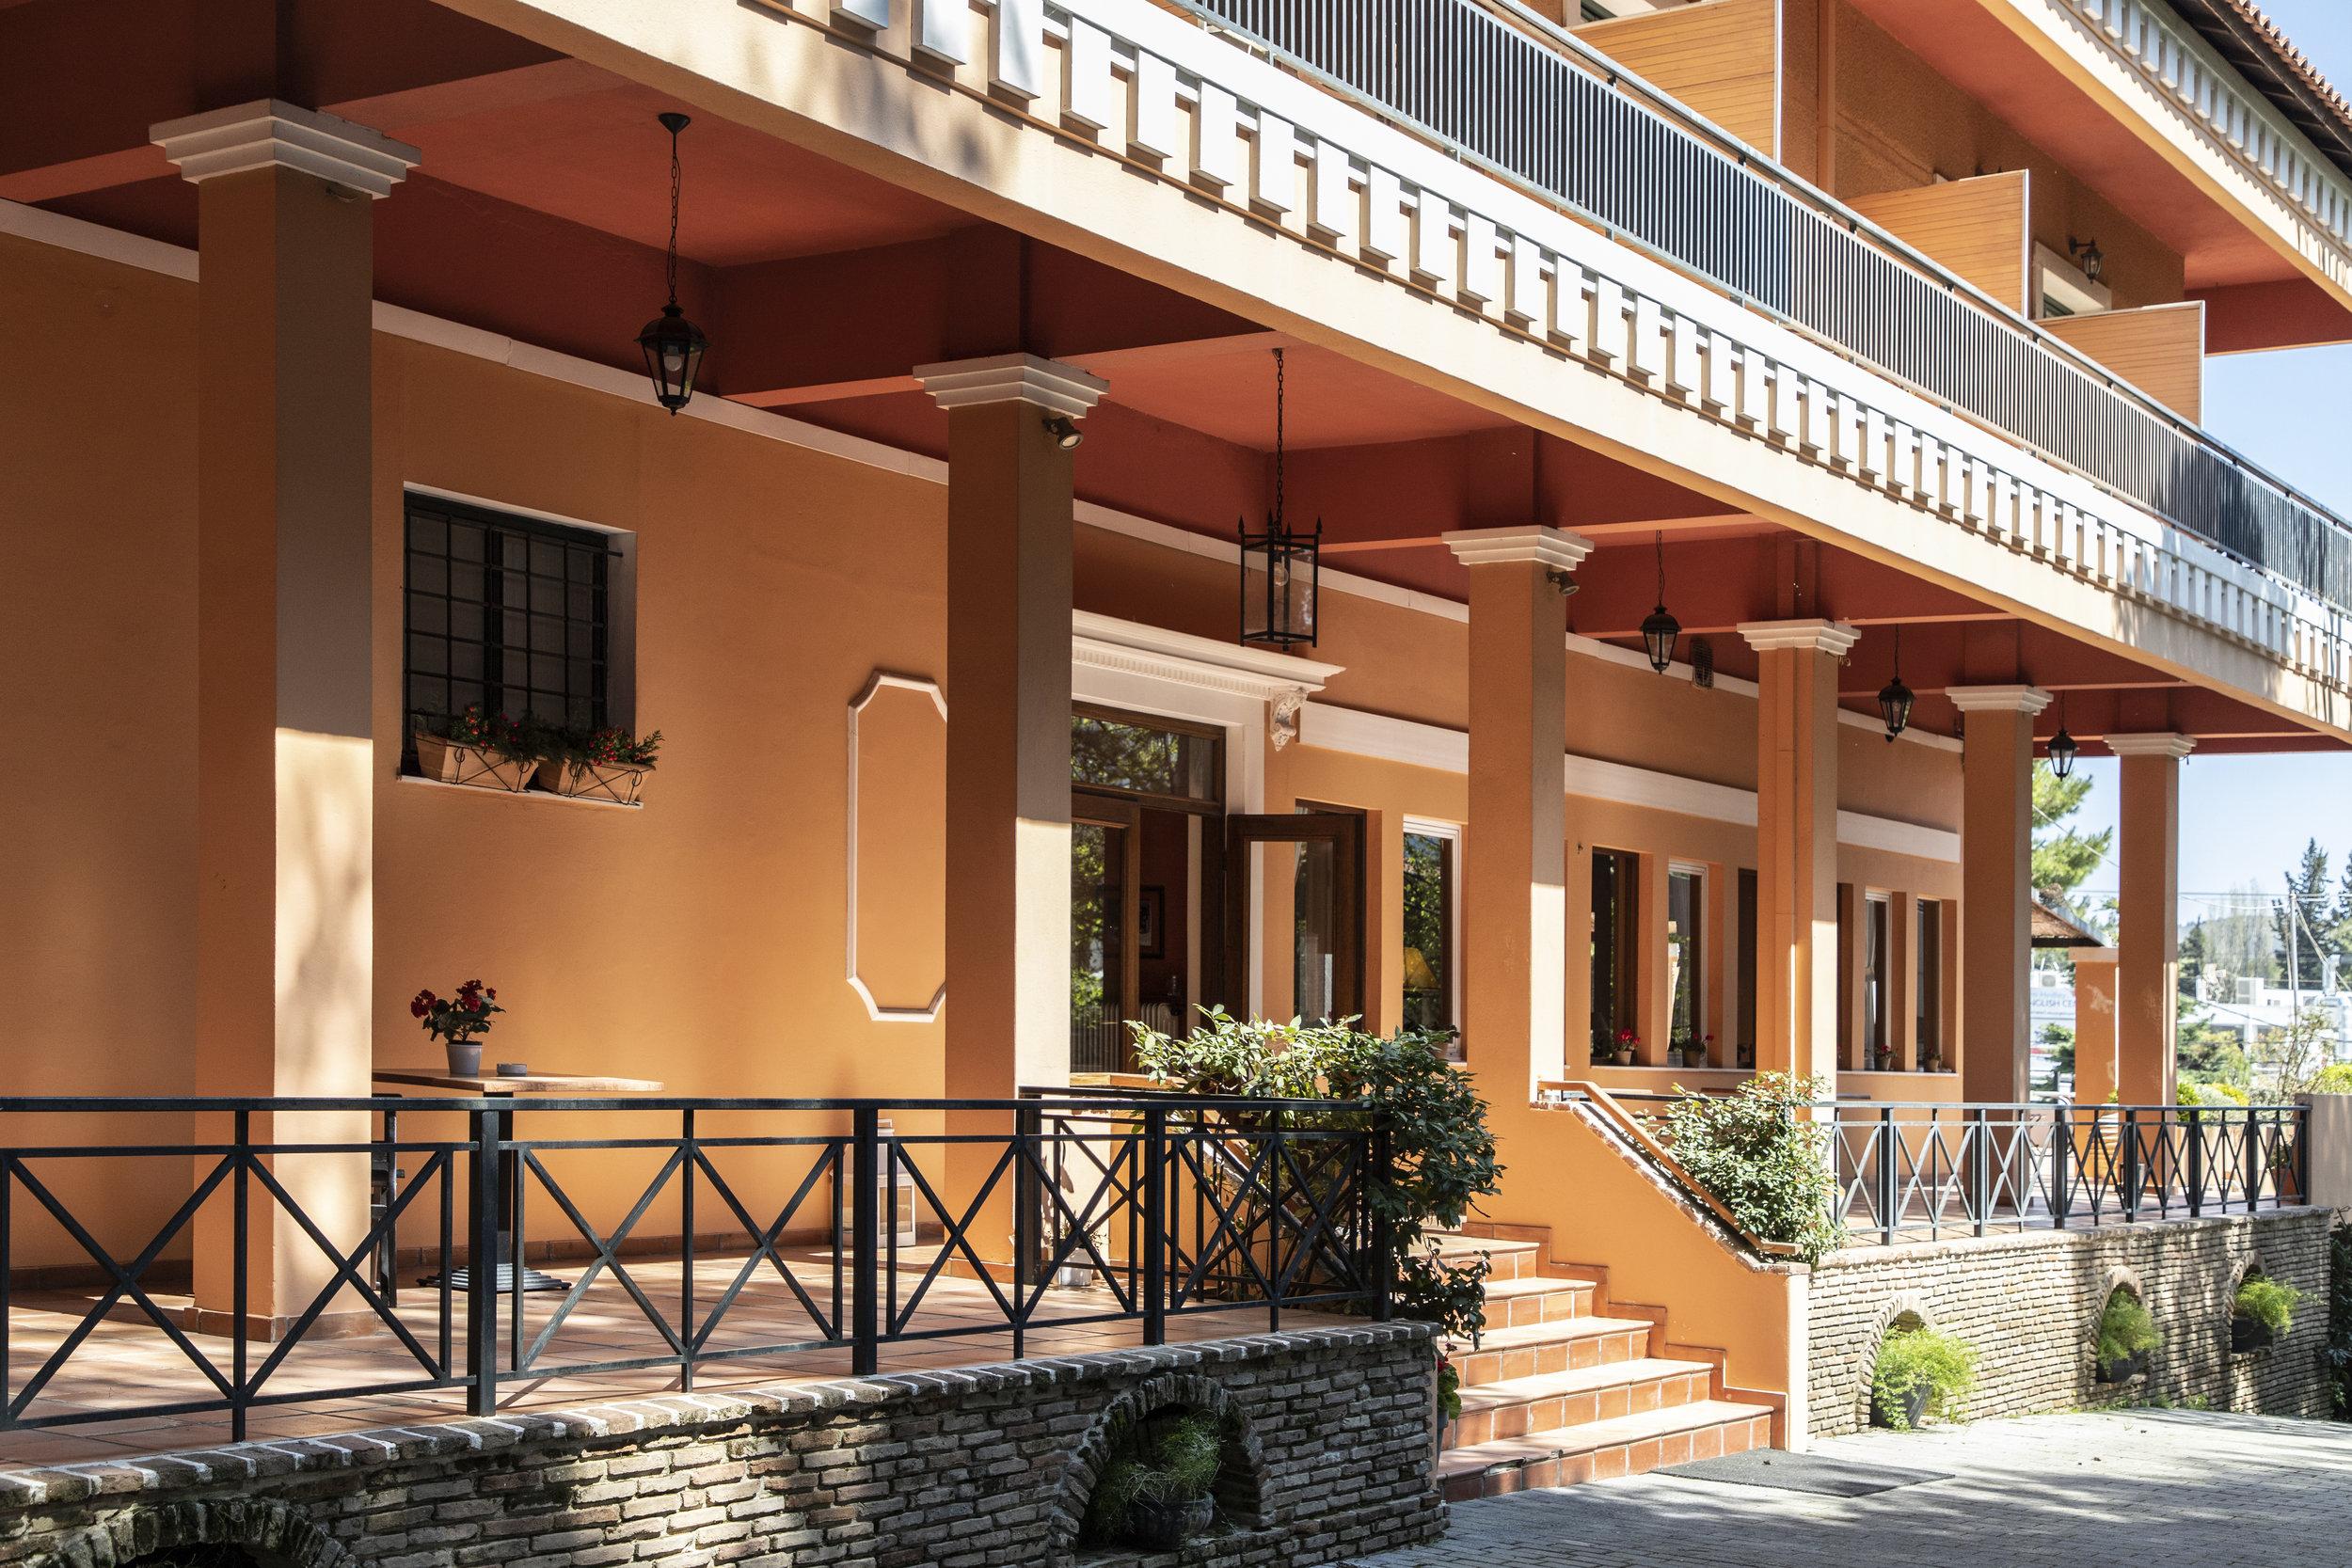 HOTEL ZORBAS - BUSSINESS HOTEL-DROSIA